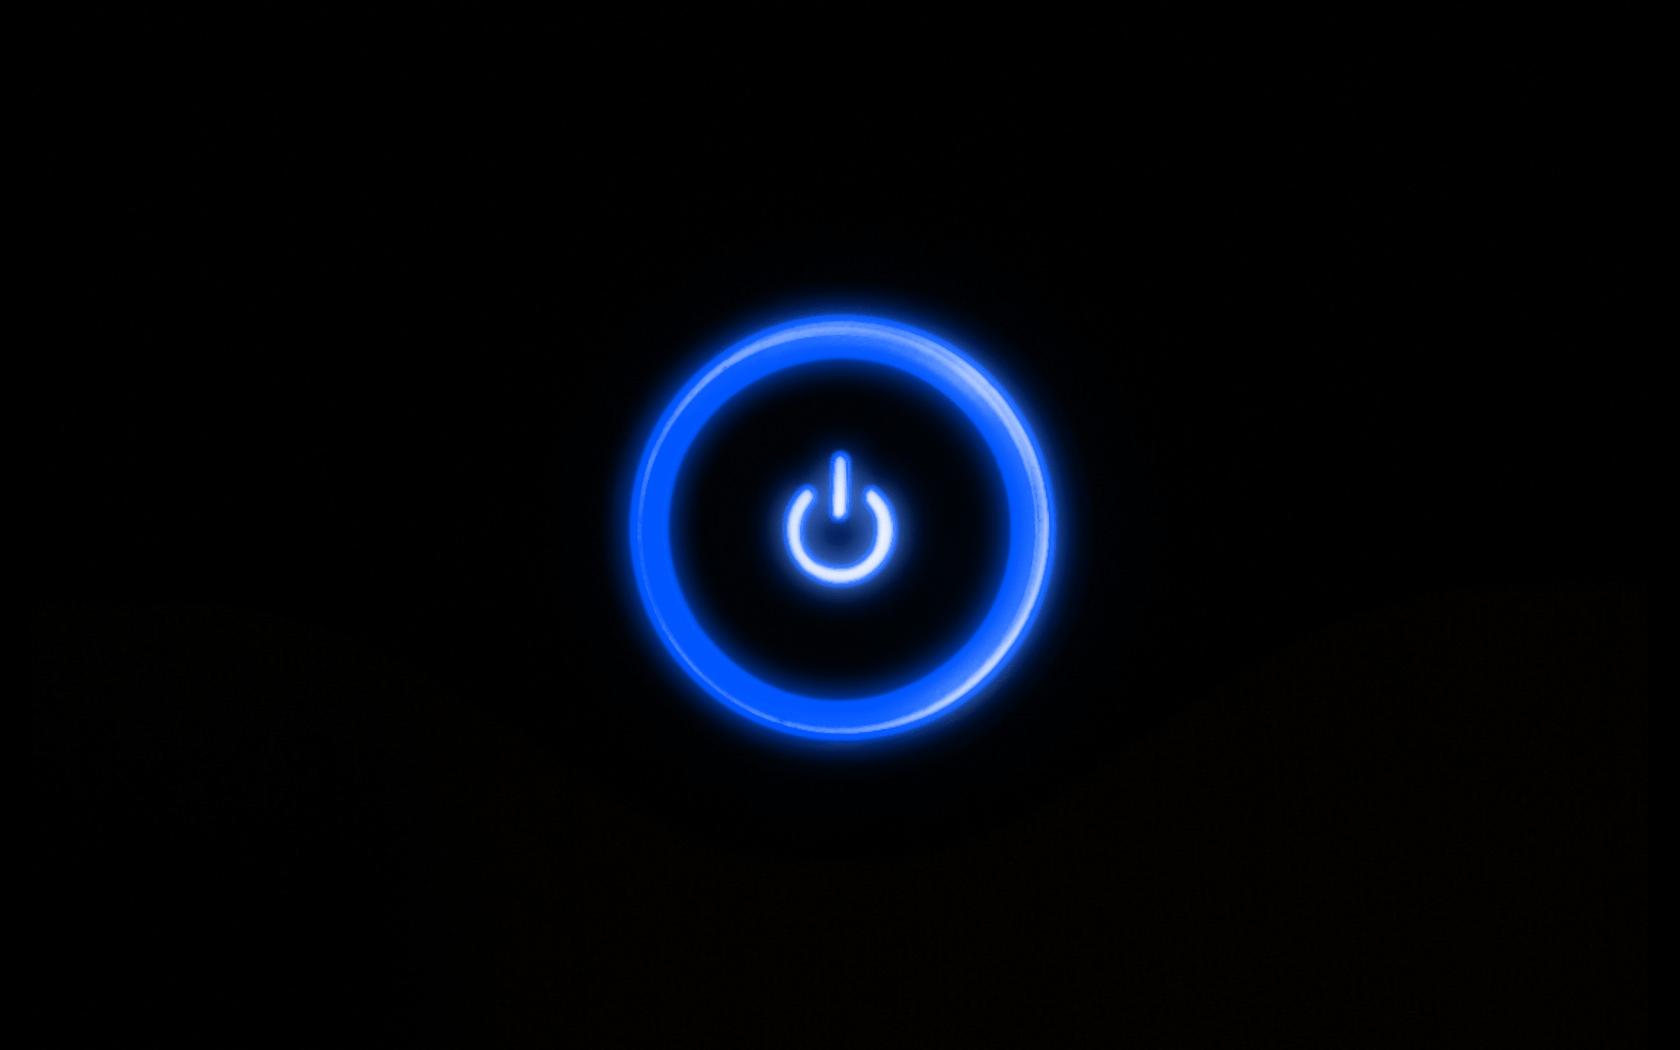 Blue Neon Wallpapers 1680x1050